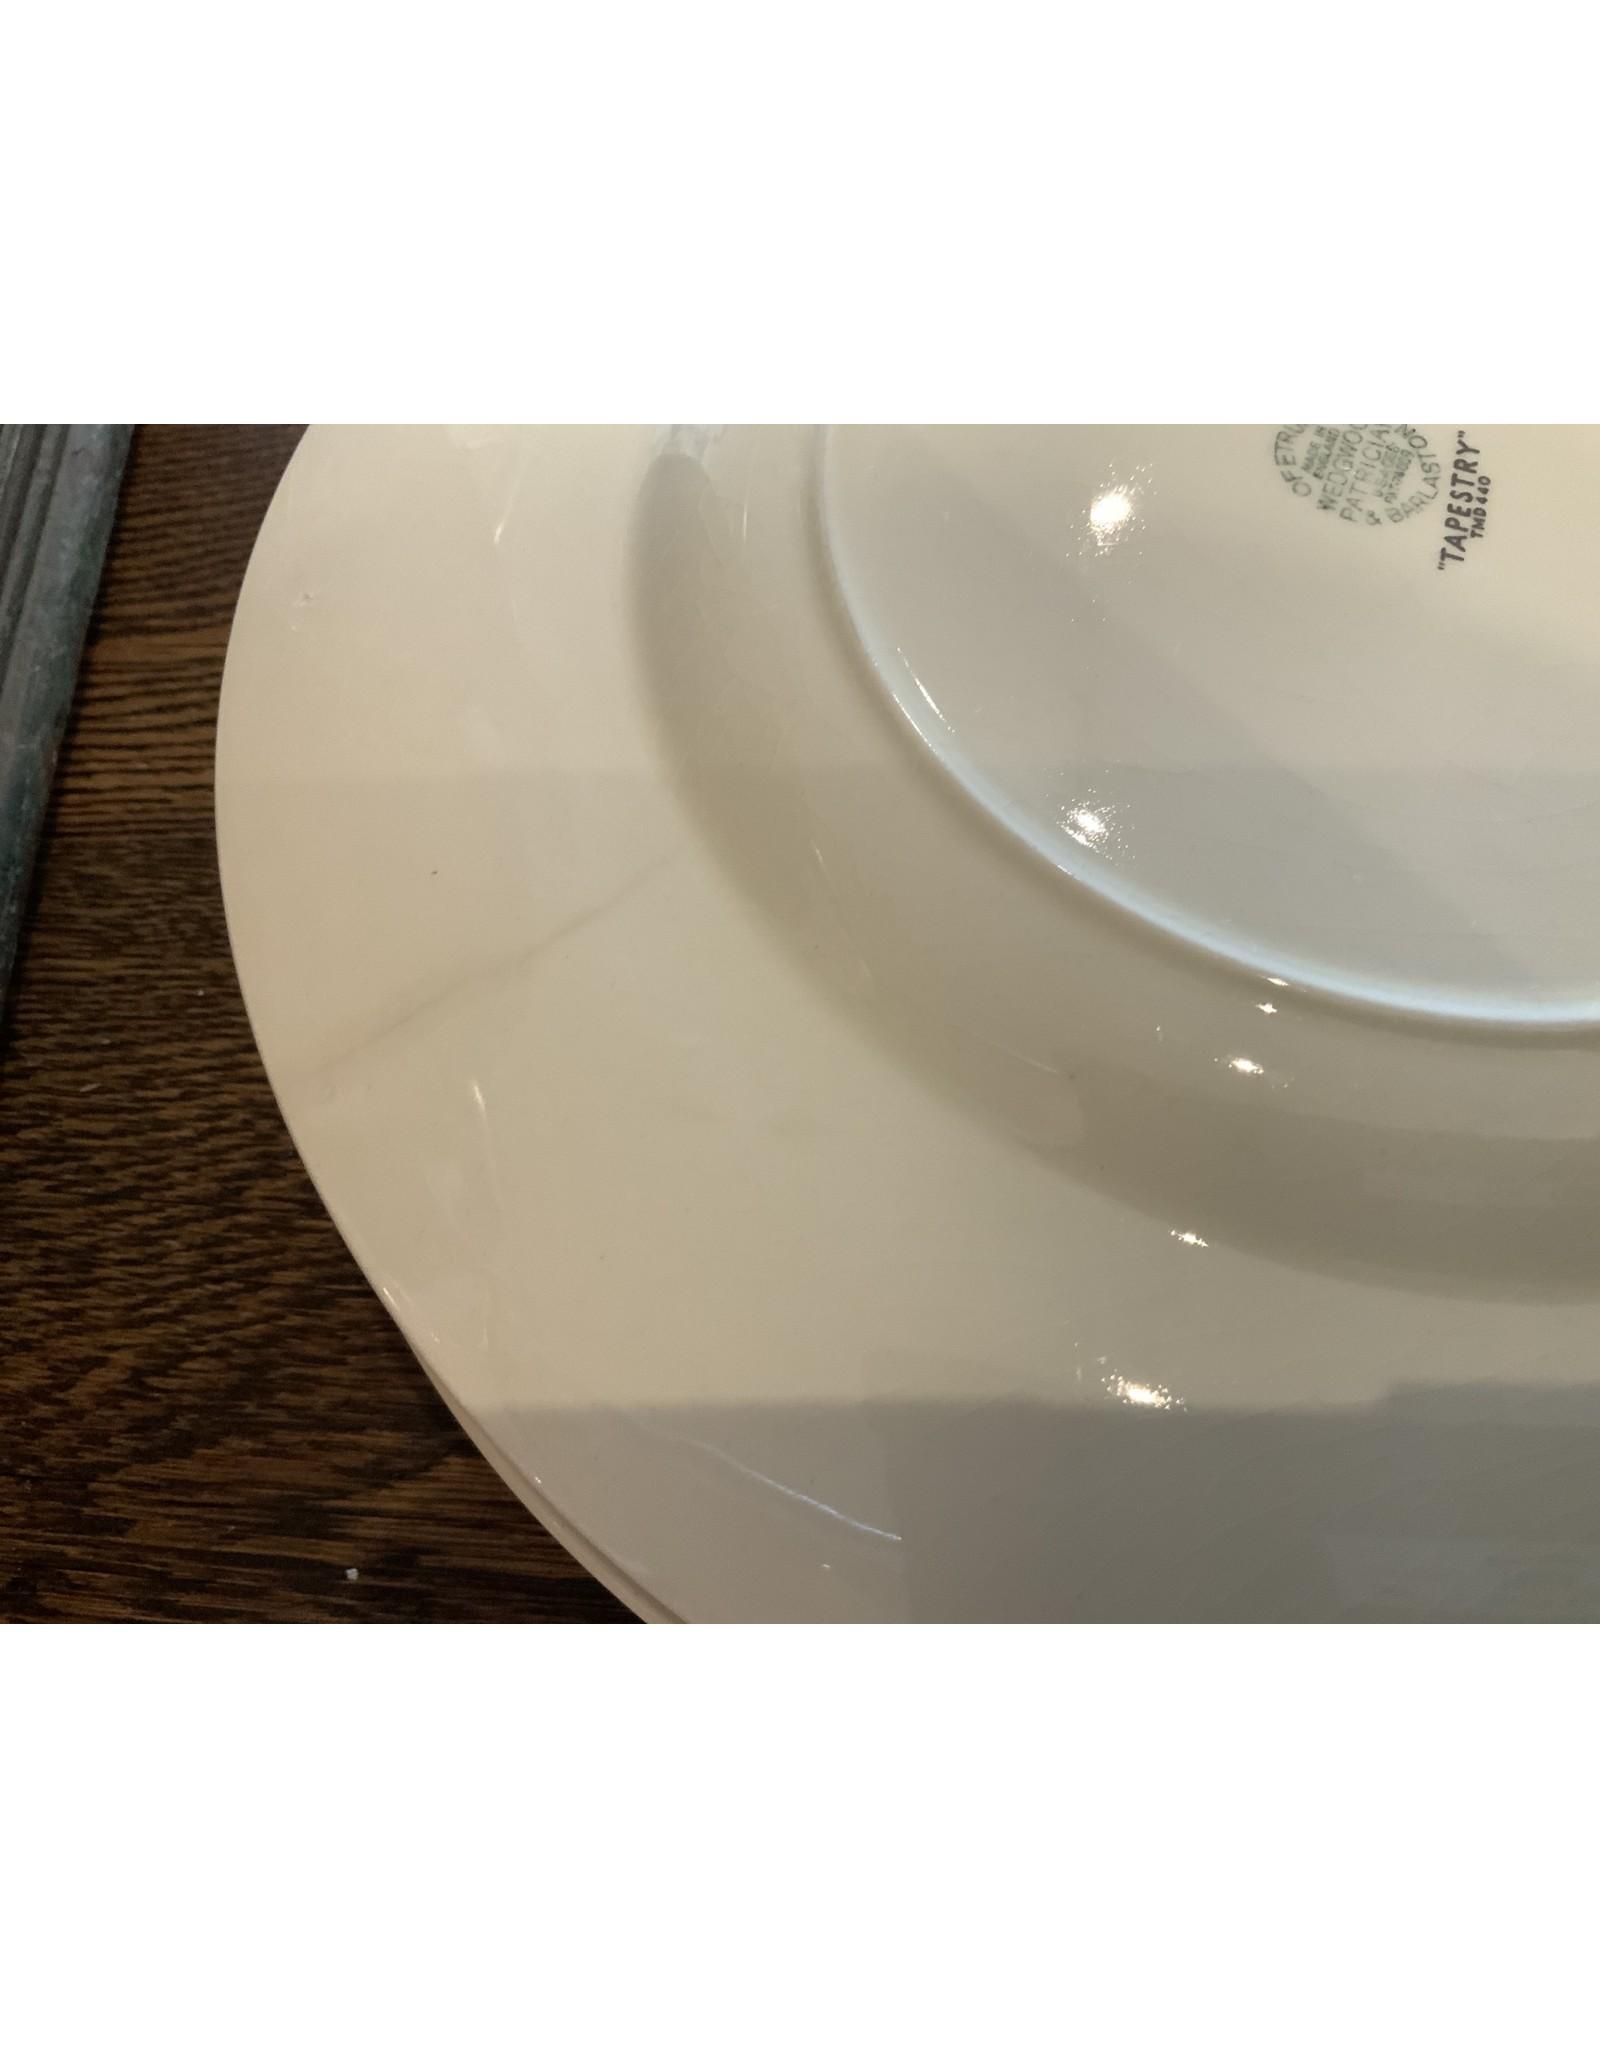 "SPV Tapestry by WEDGWOOD 10 1/2"" Dinner Plate set of 10"